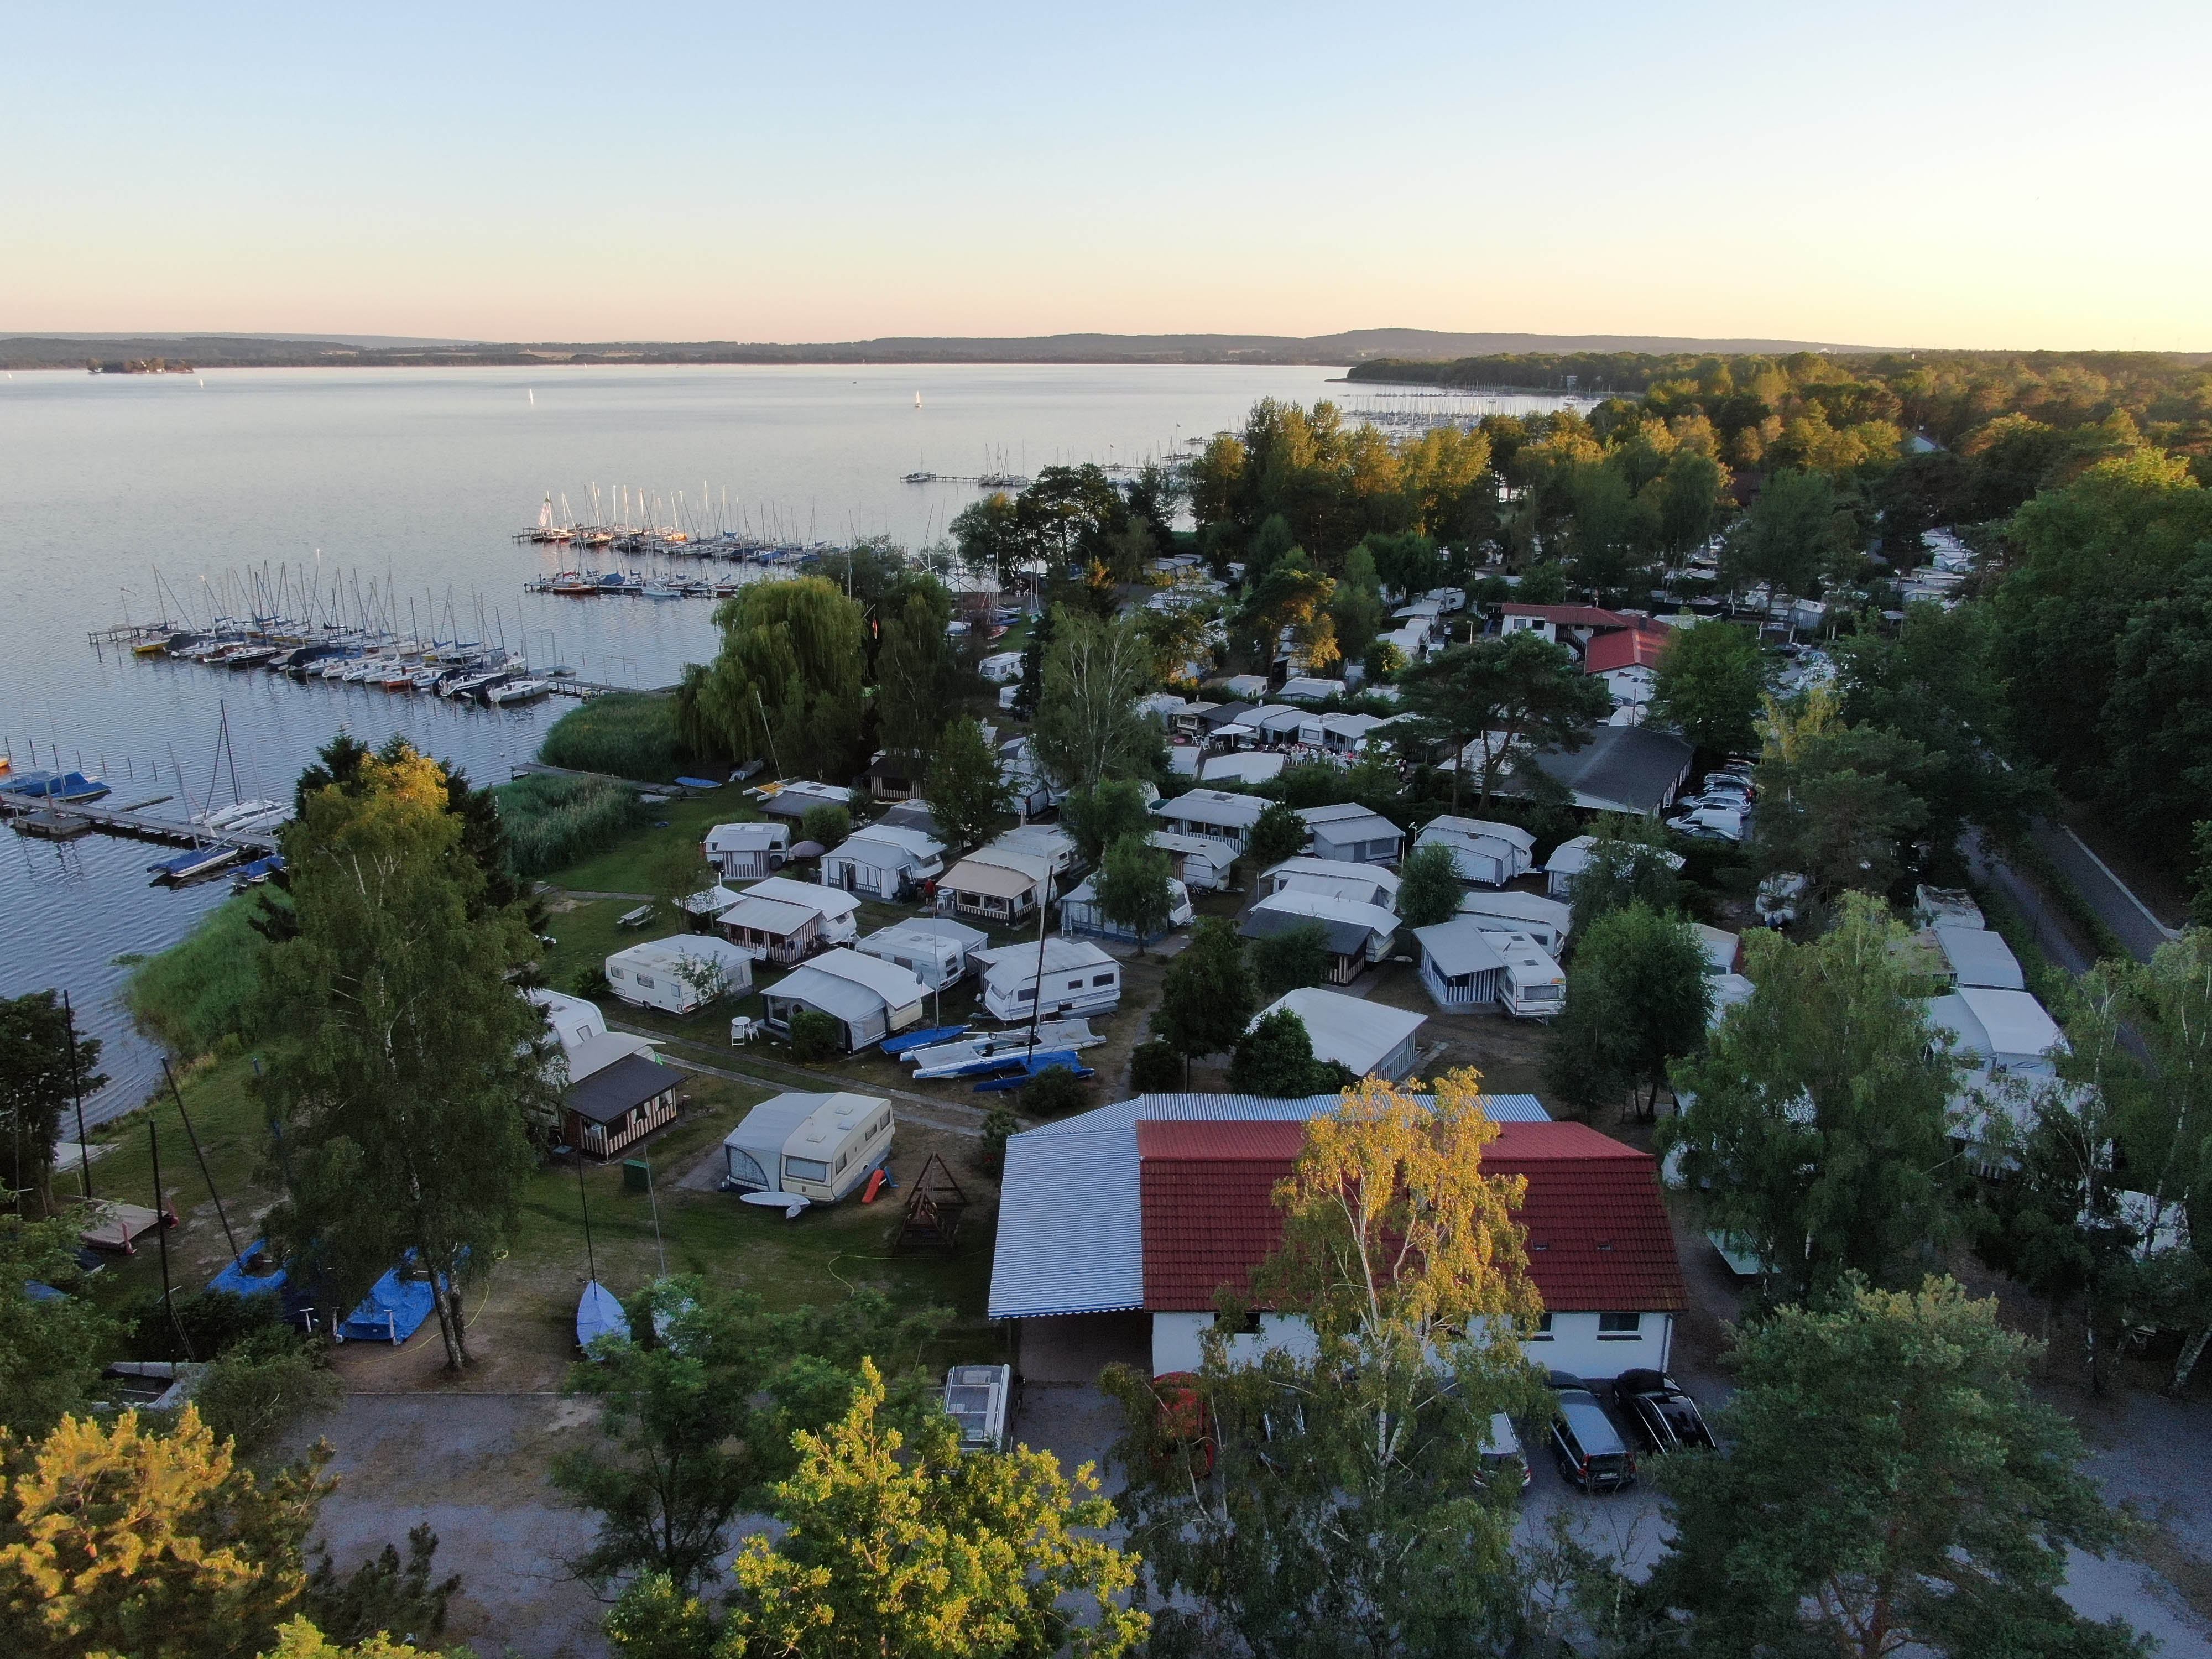 Campingplatz Mardorf02